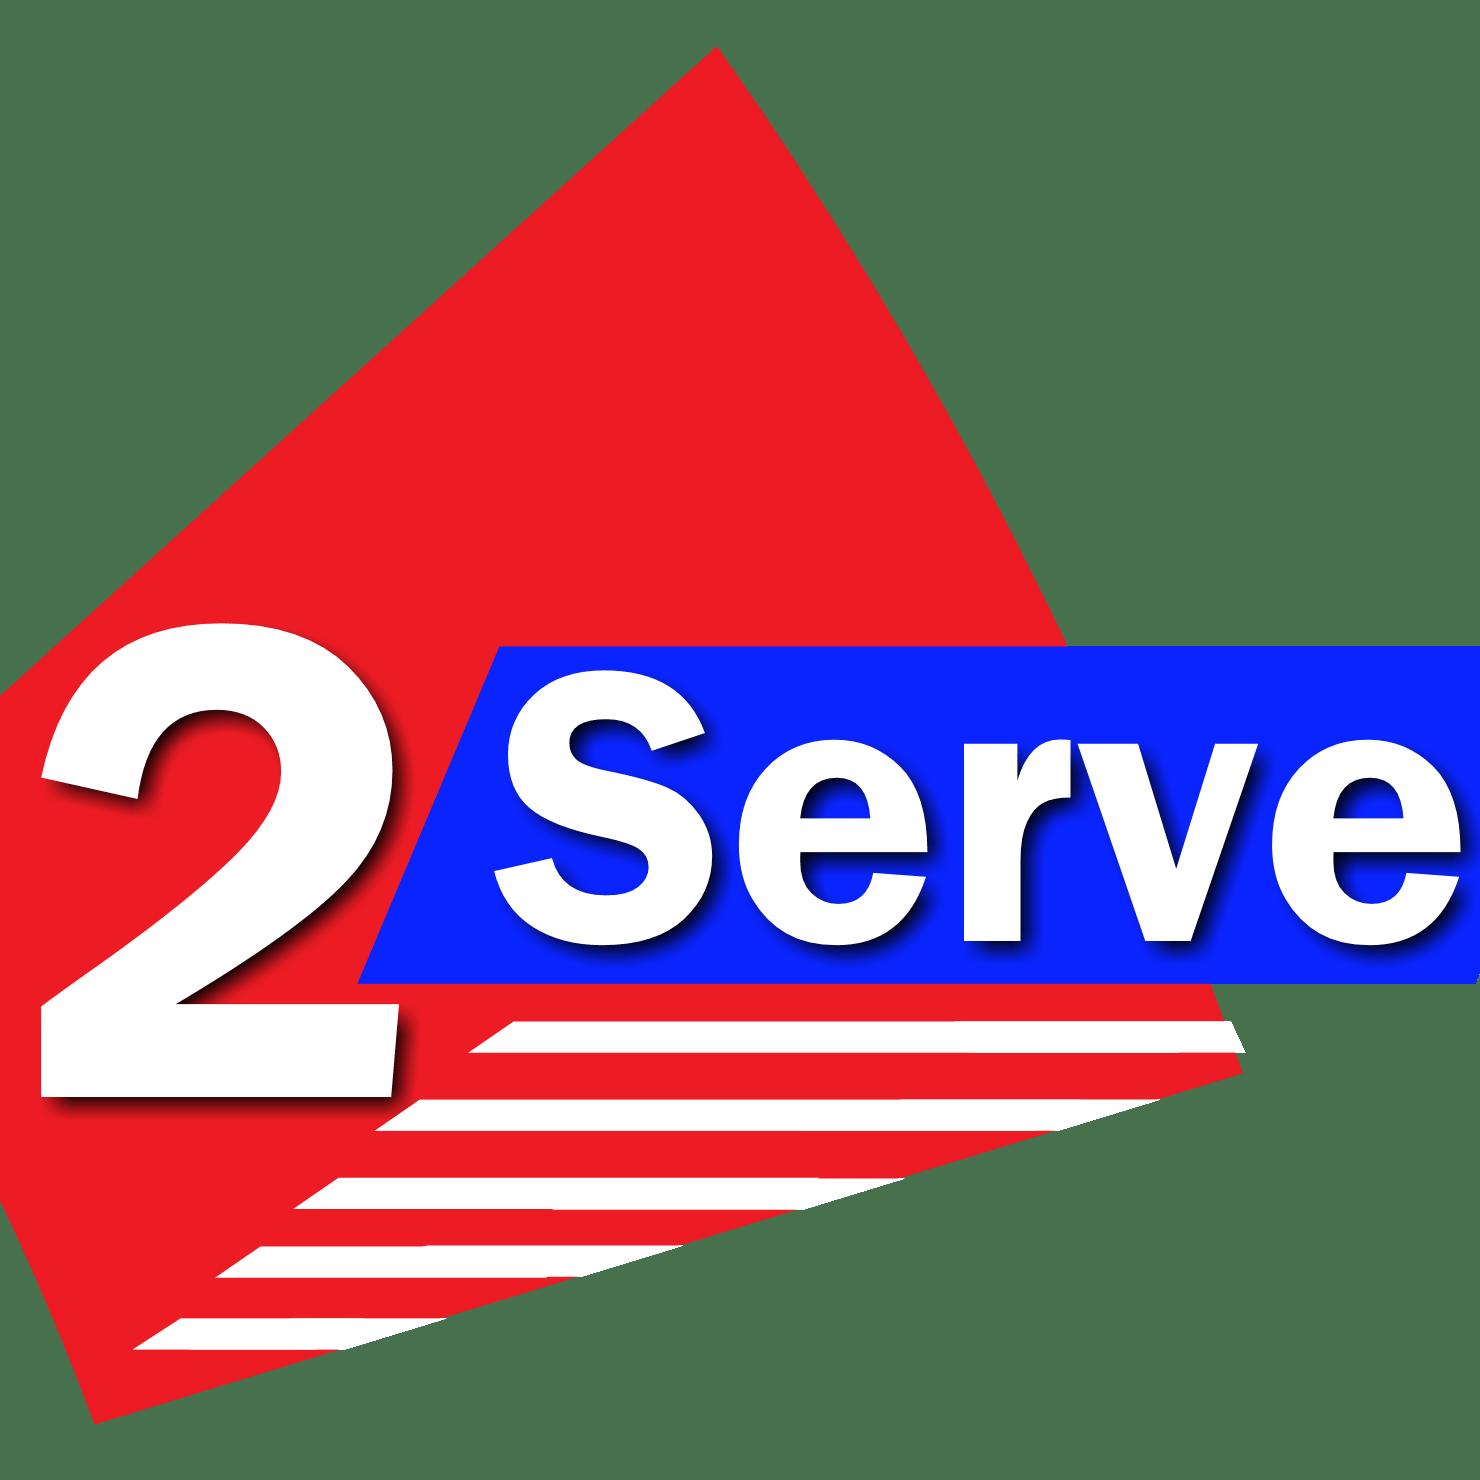 2Serve Solutions logo